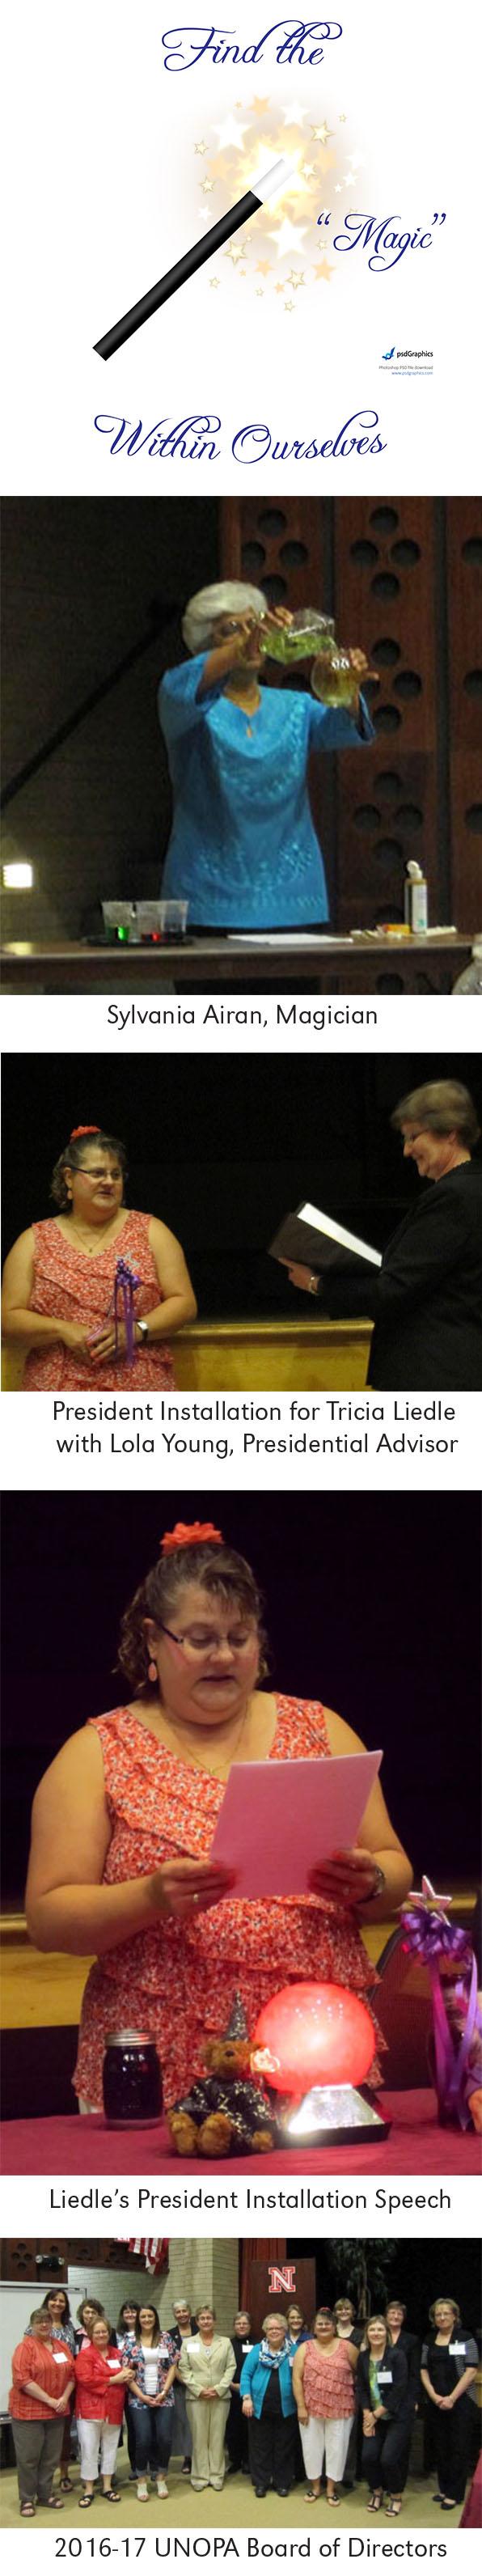 Liedle's installation